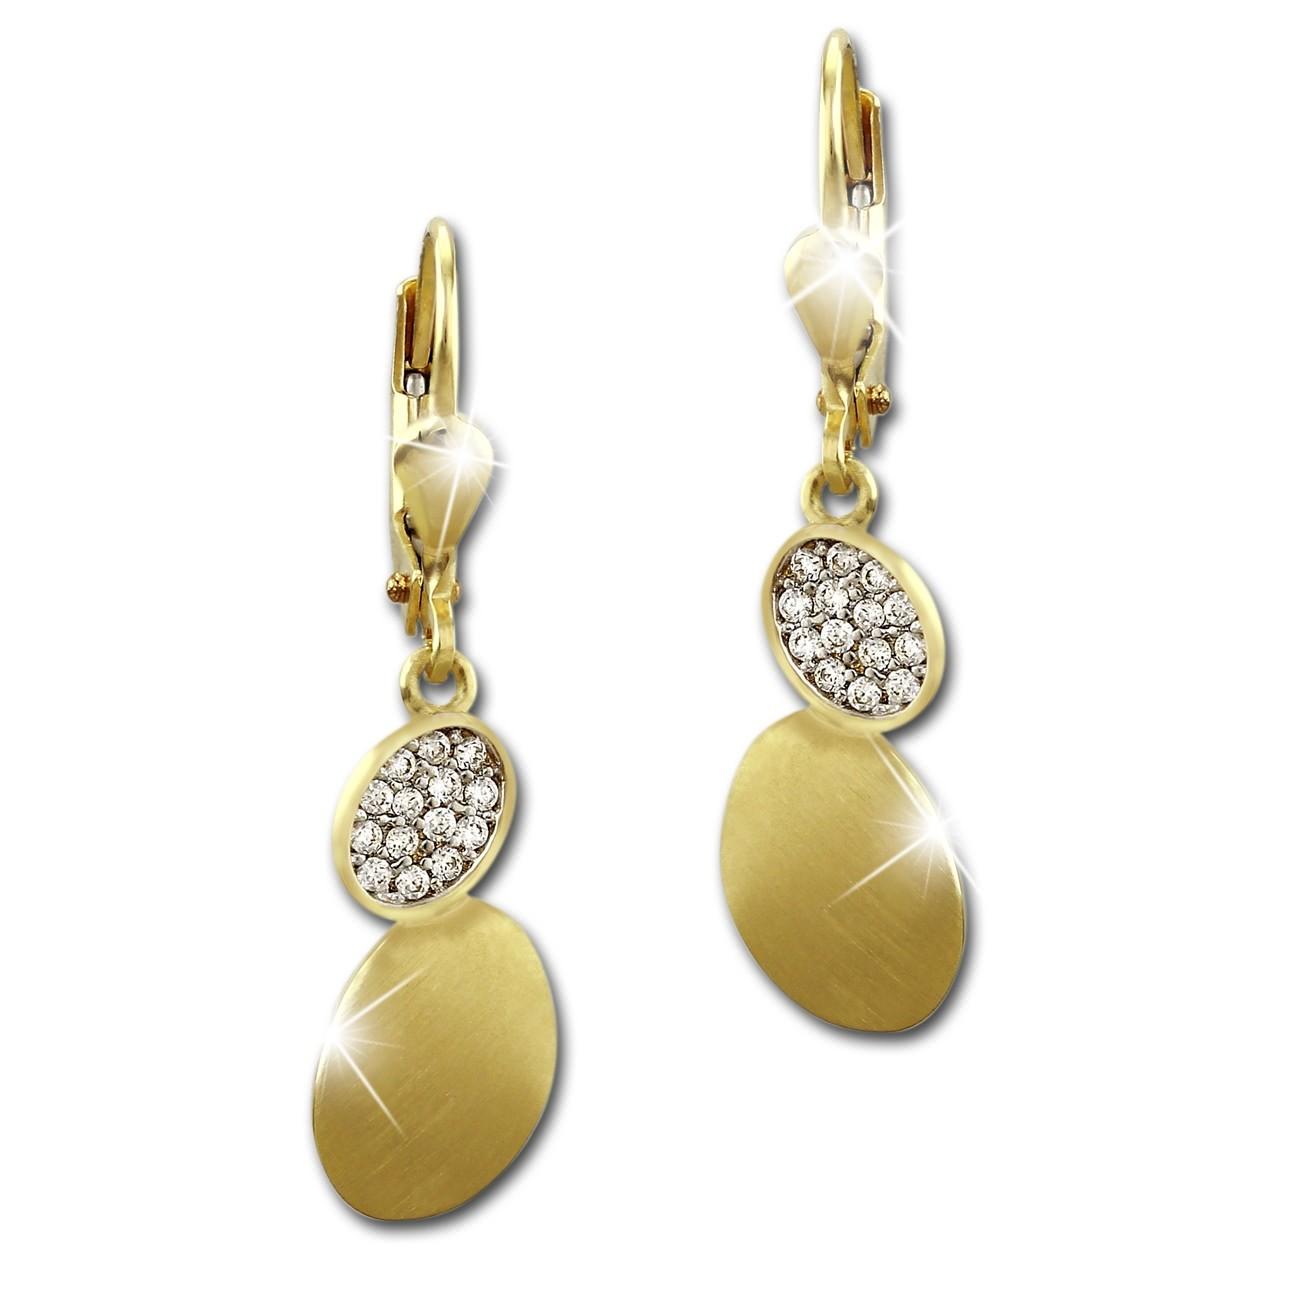 SilberDream Ohrhänger Oval Zirkonia weiß Ohrring 333 Gold Echtschmuck GDO531WY